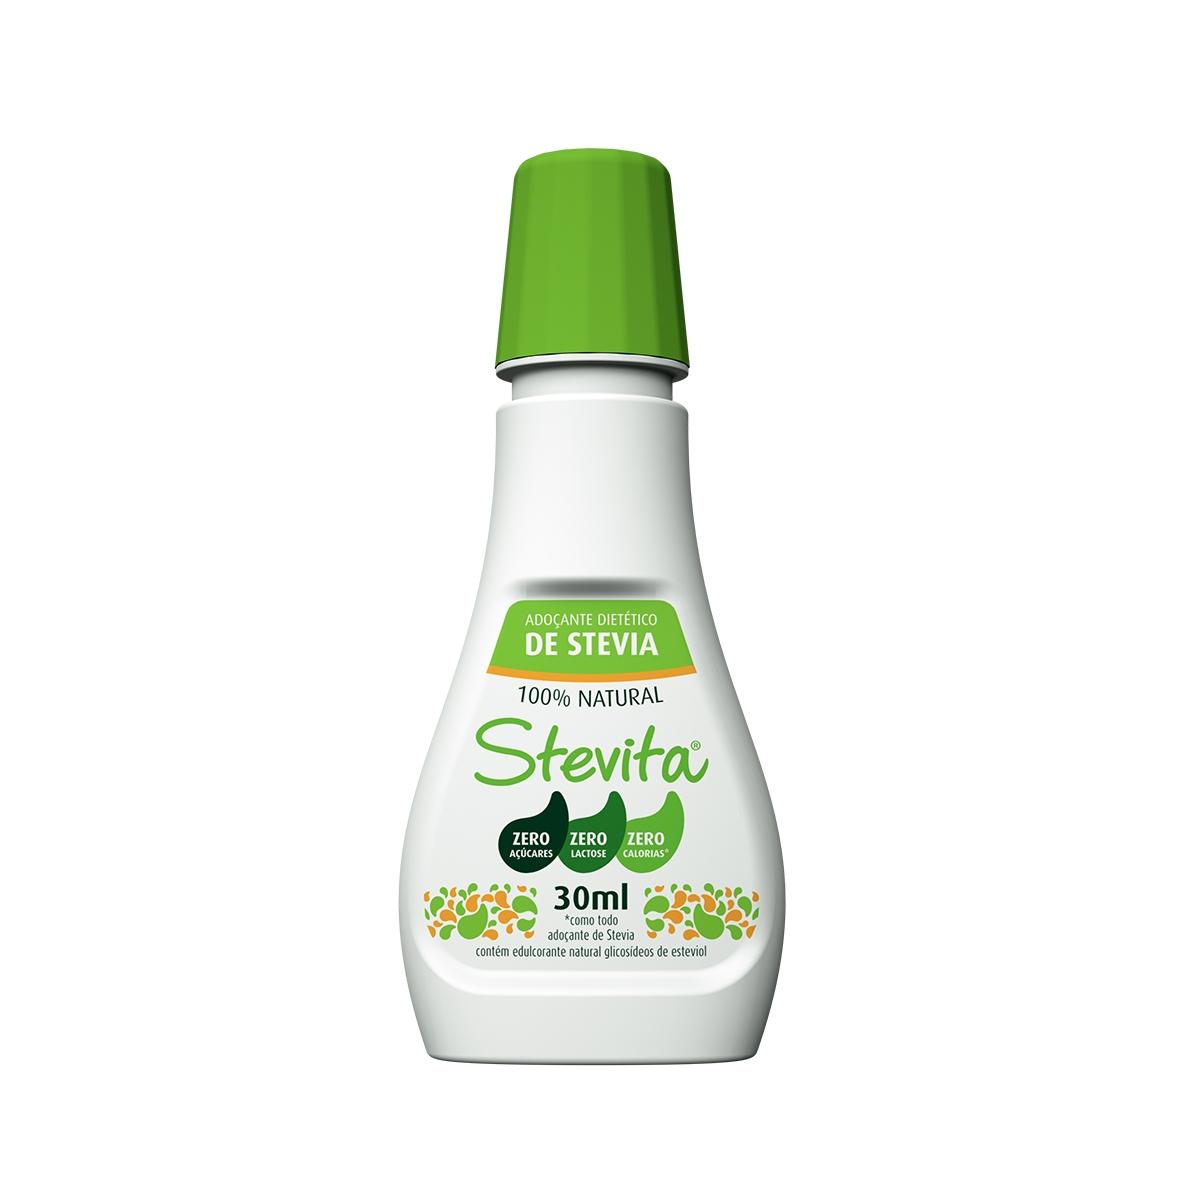 Adoçante só Stevia 30ml - Stevita